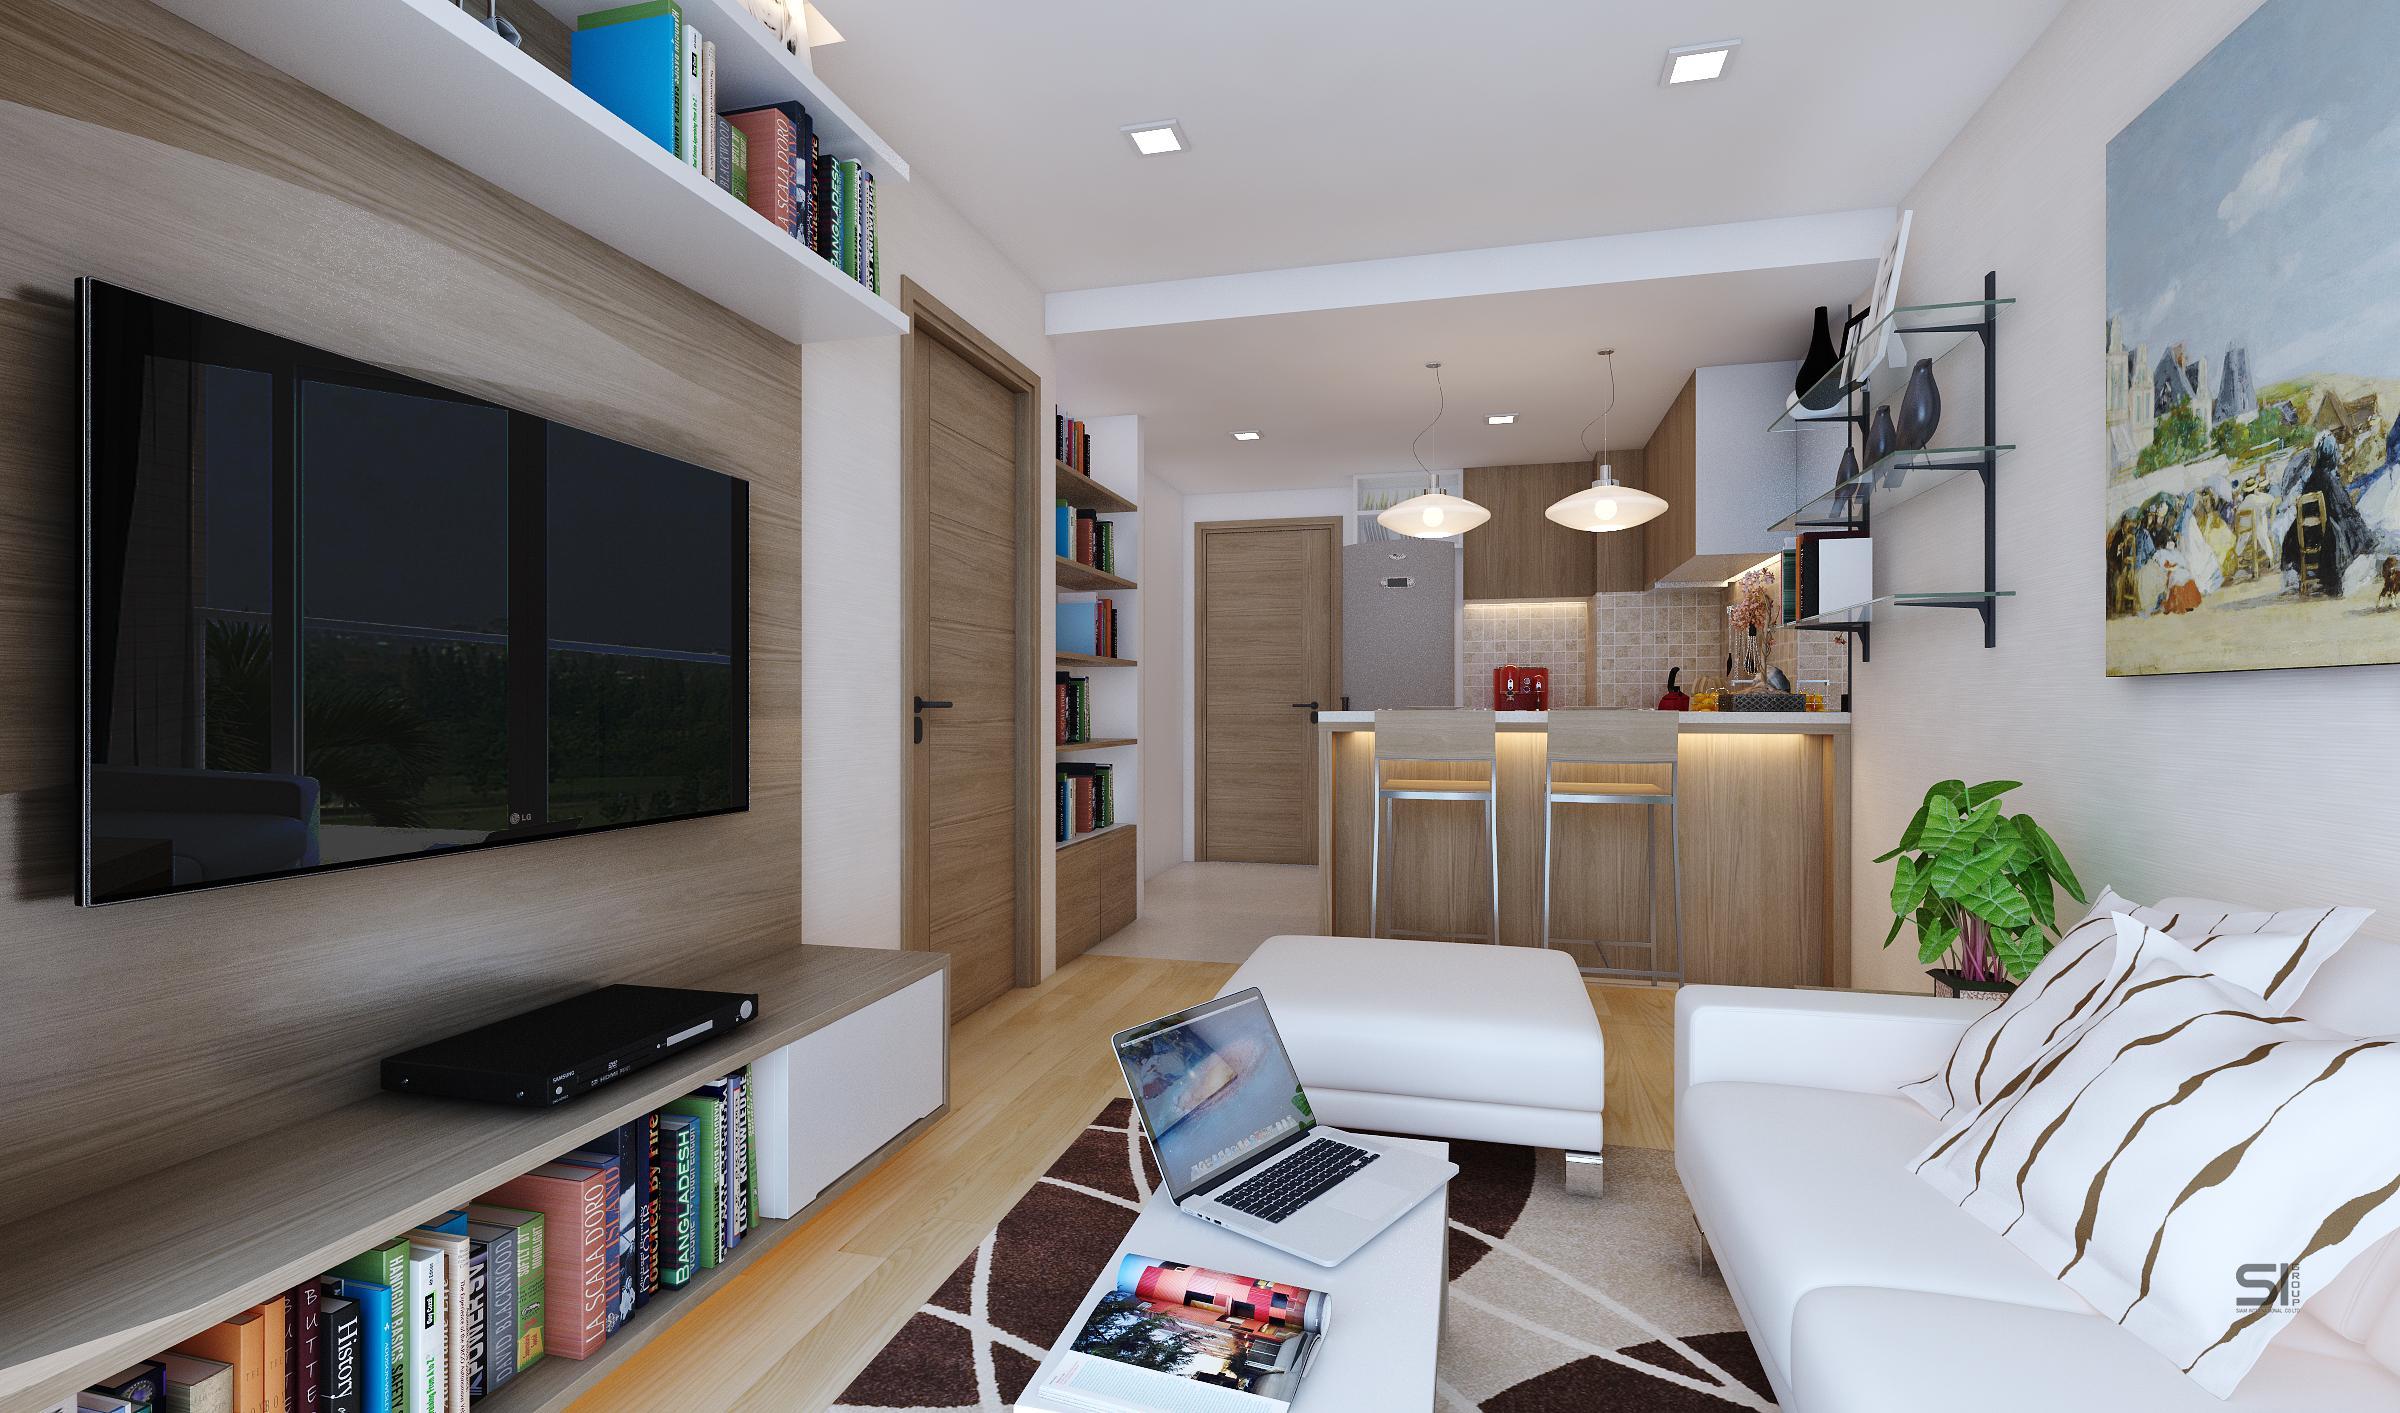 Apartments Phuket